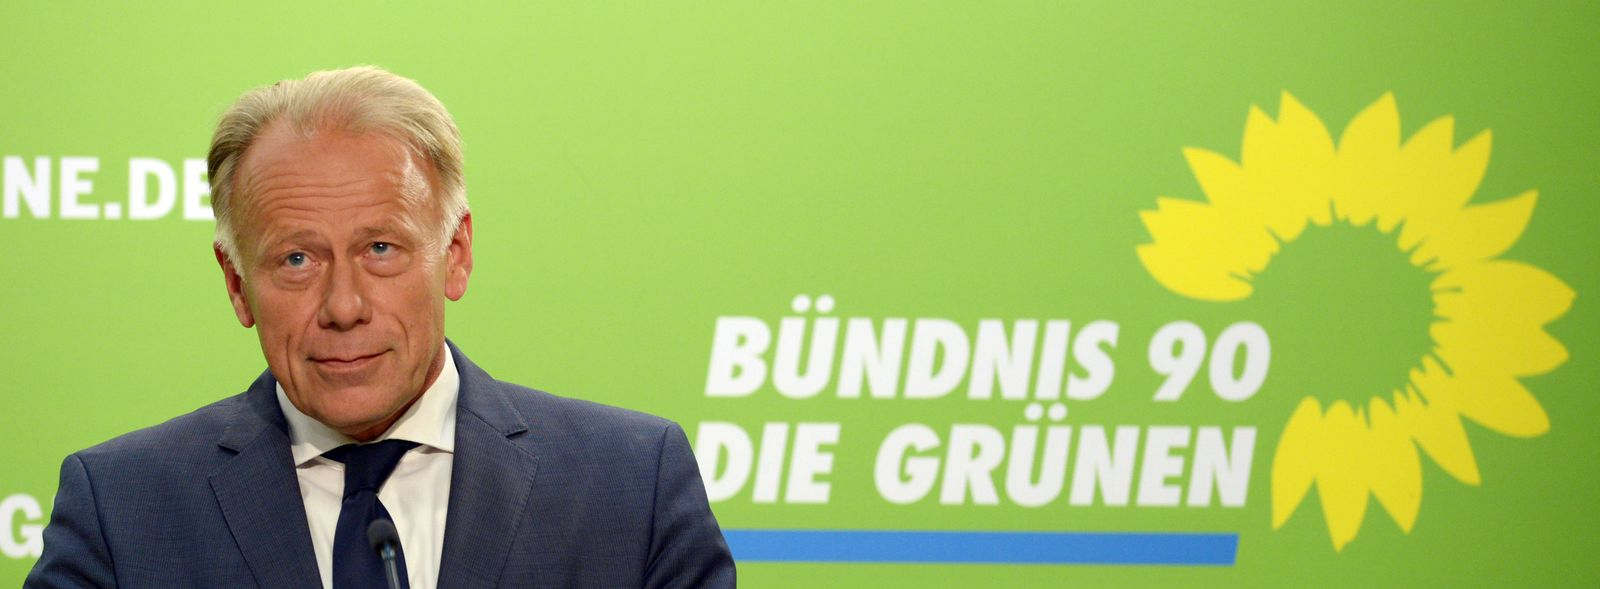 Trittin / Bündnis 90 / Die Grünen